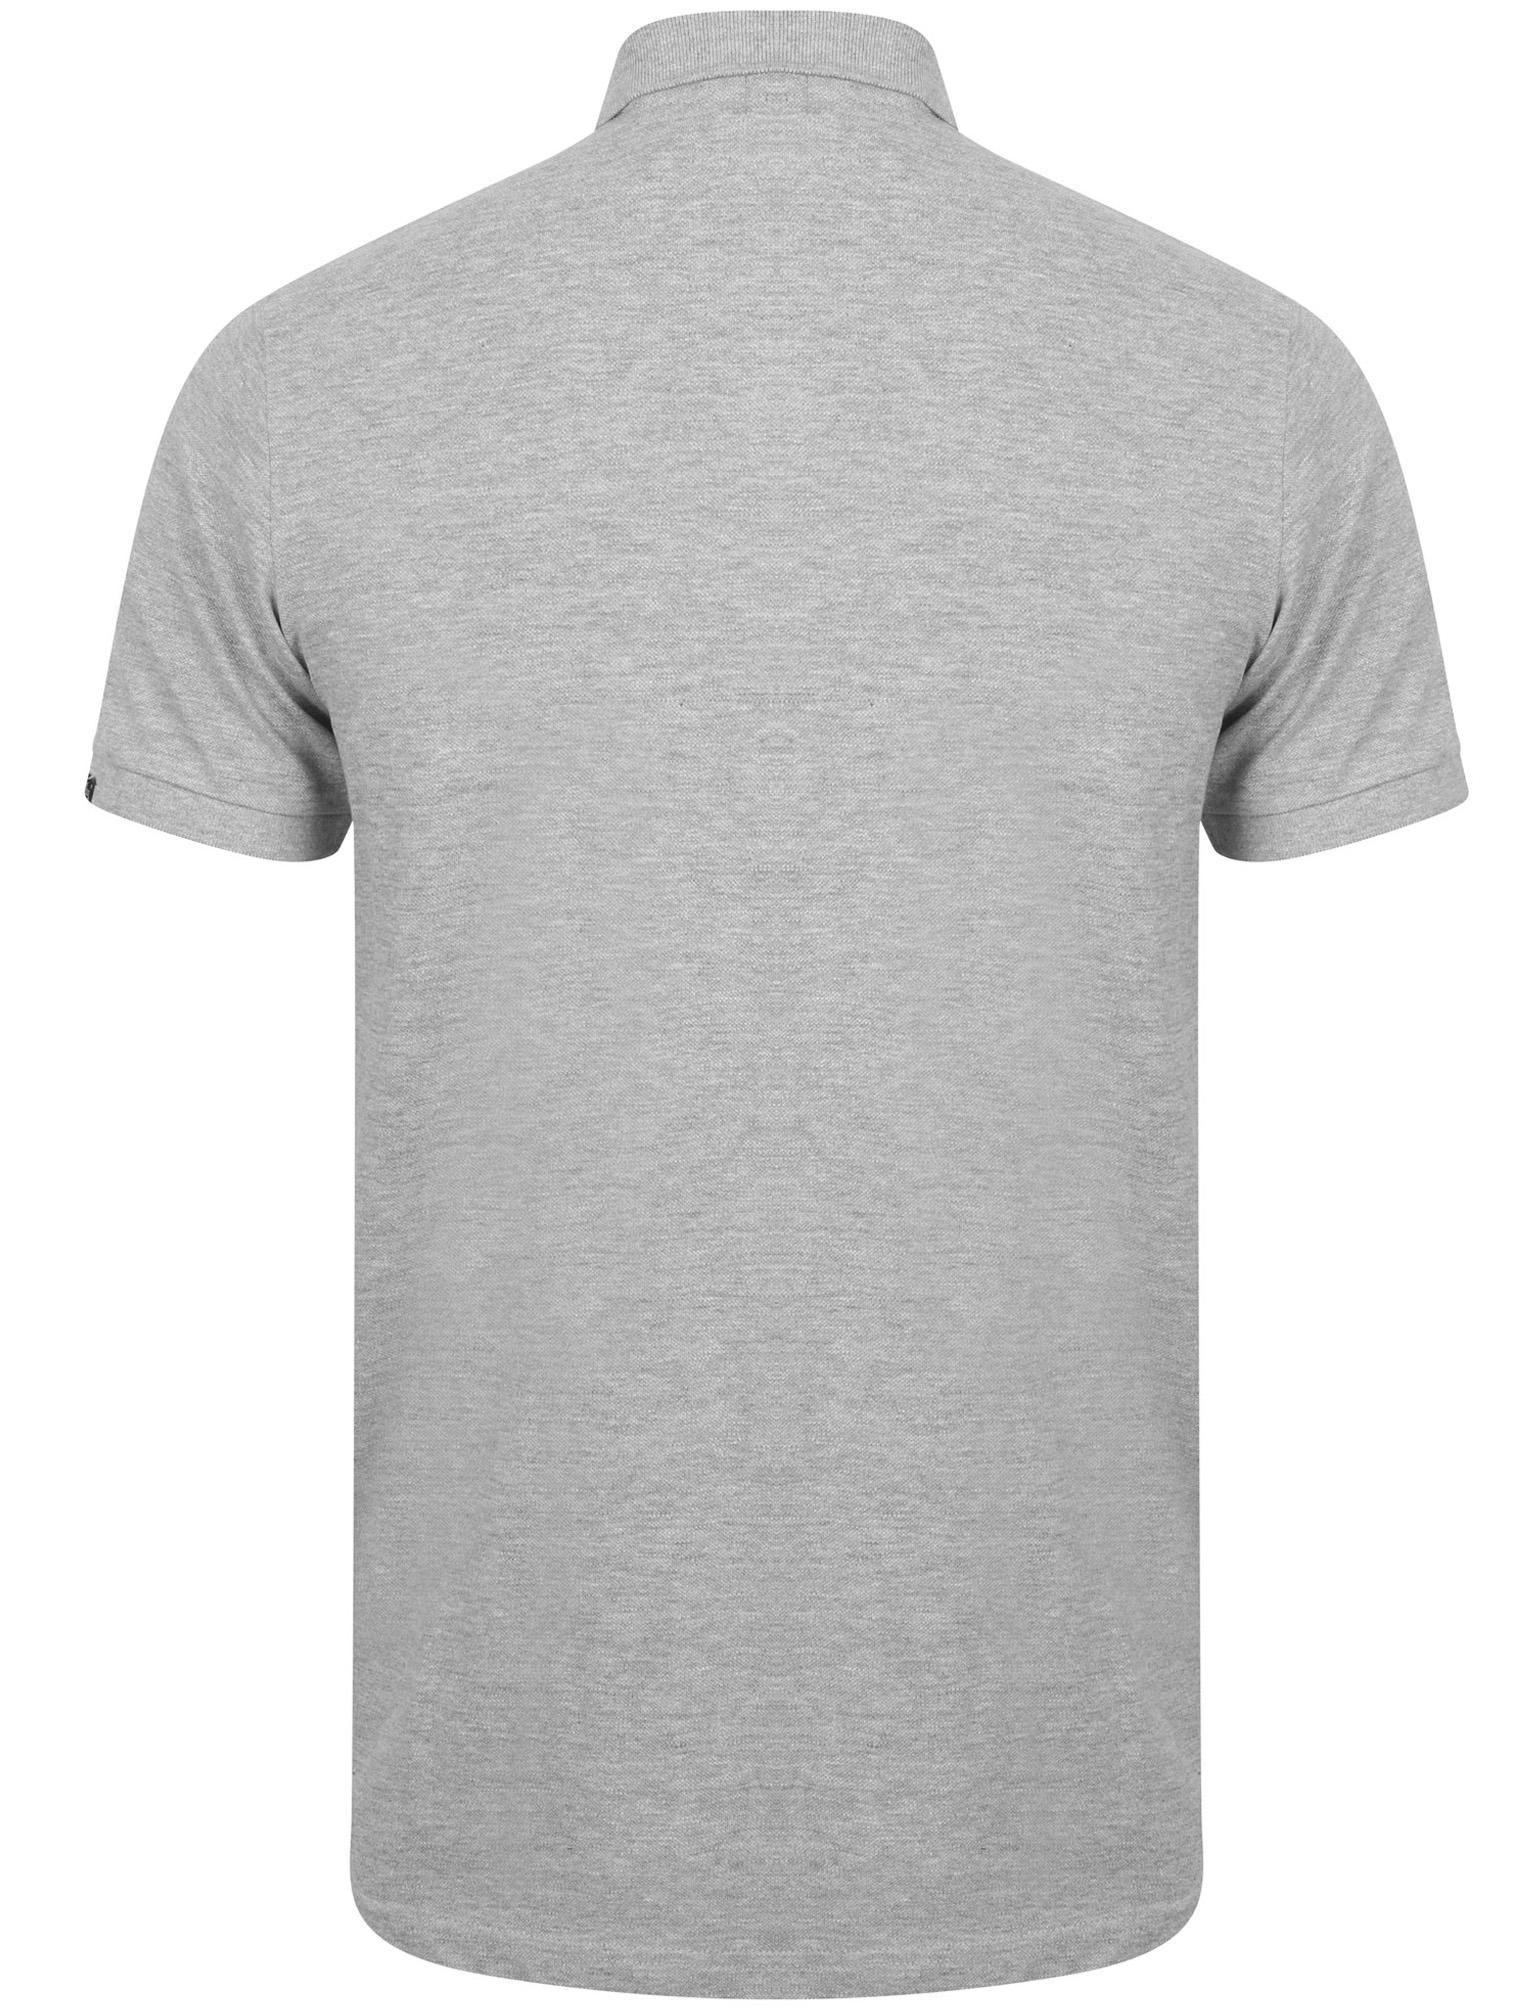 New-Mens-Tokyo-Laundry-Branded-Kuusamo-Cotton-Rich-Pique-Polo-Shirt-Size-S-XXL thumbnail 7